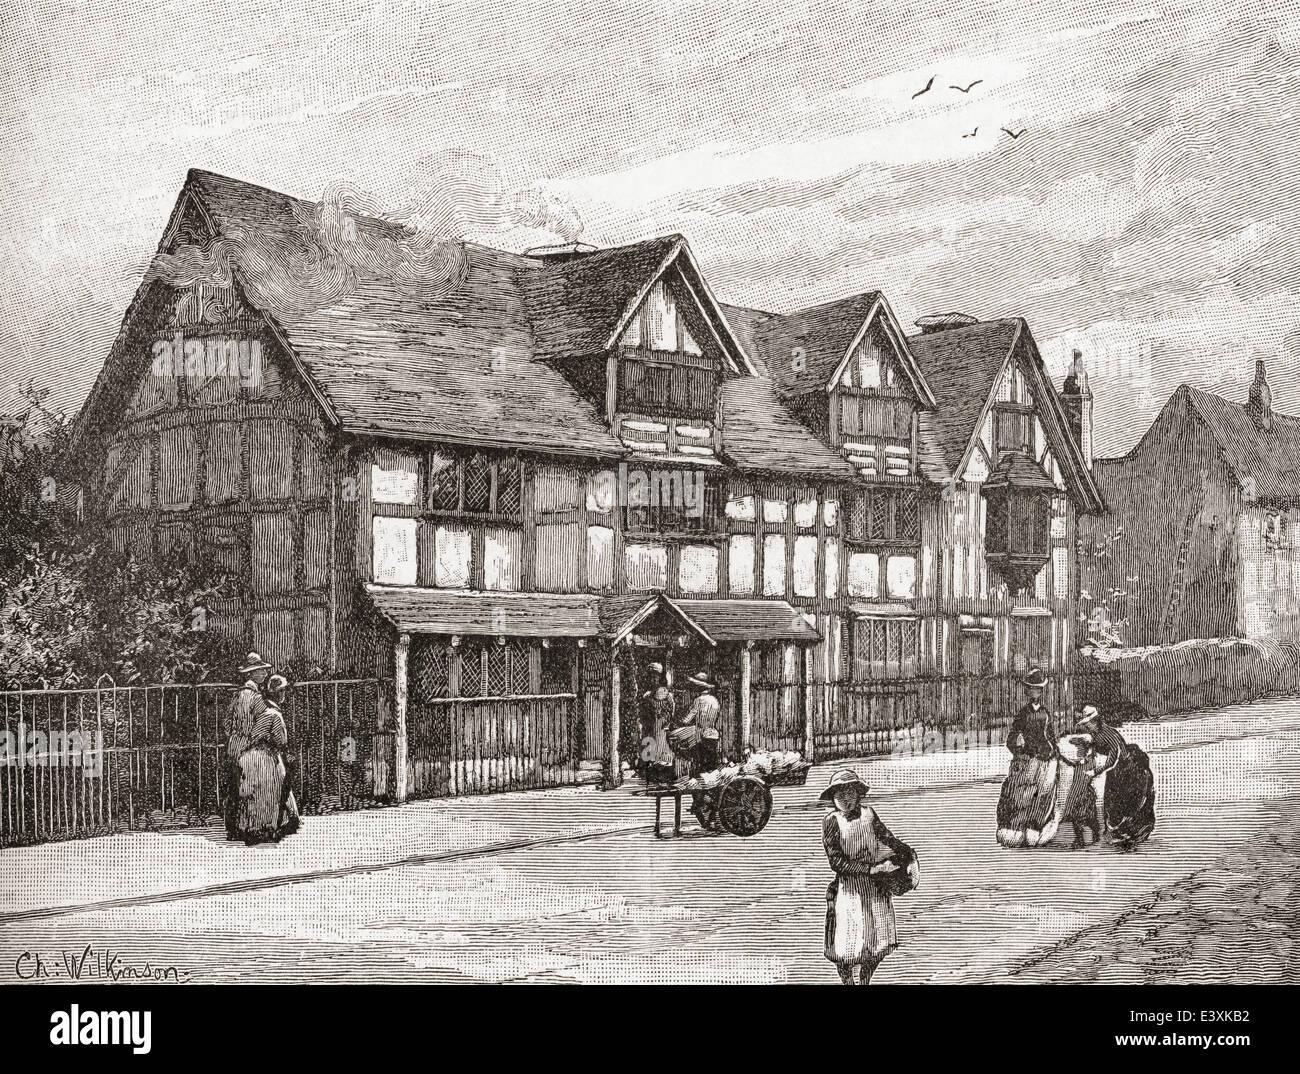 Shakespeares Birthplace Henley Street Stratford Upon Avon Warwickshire England